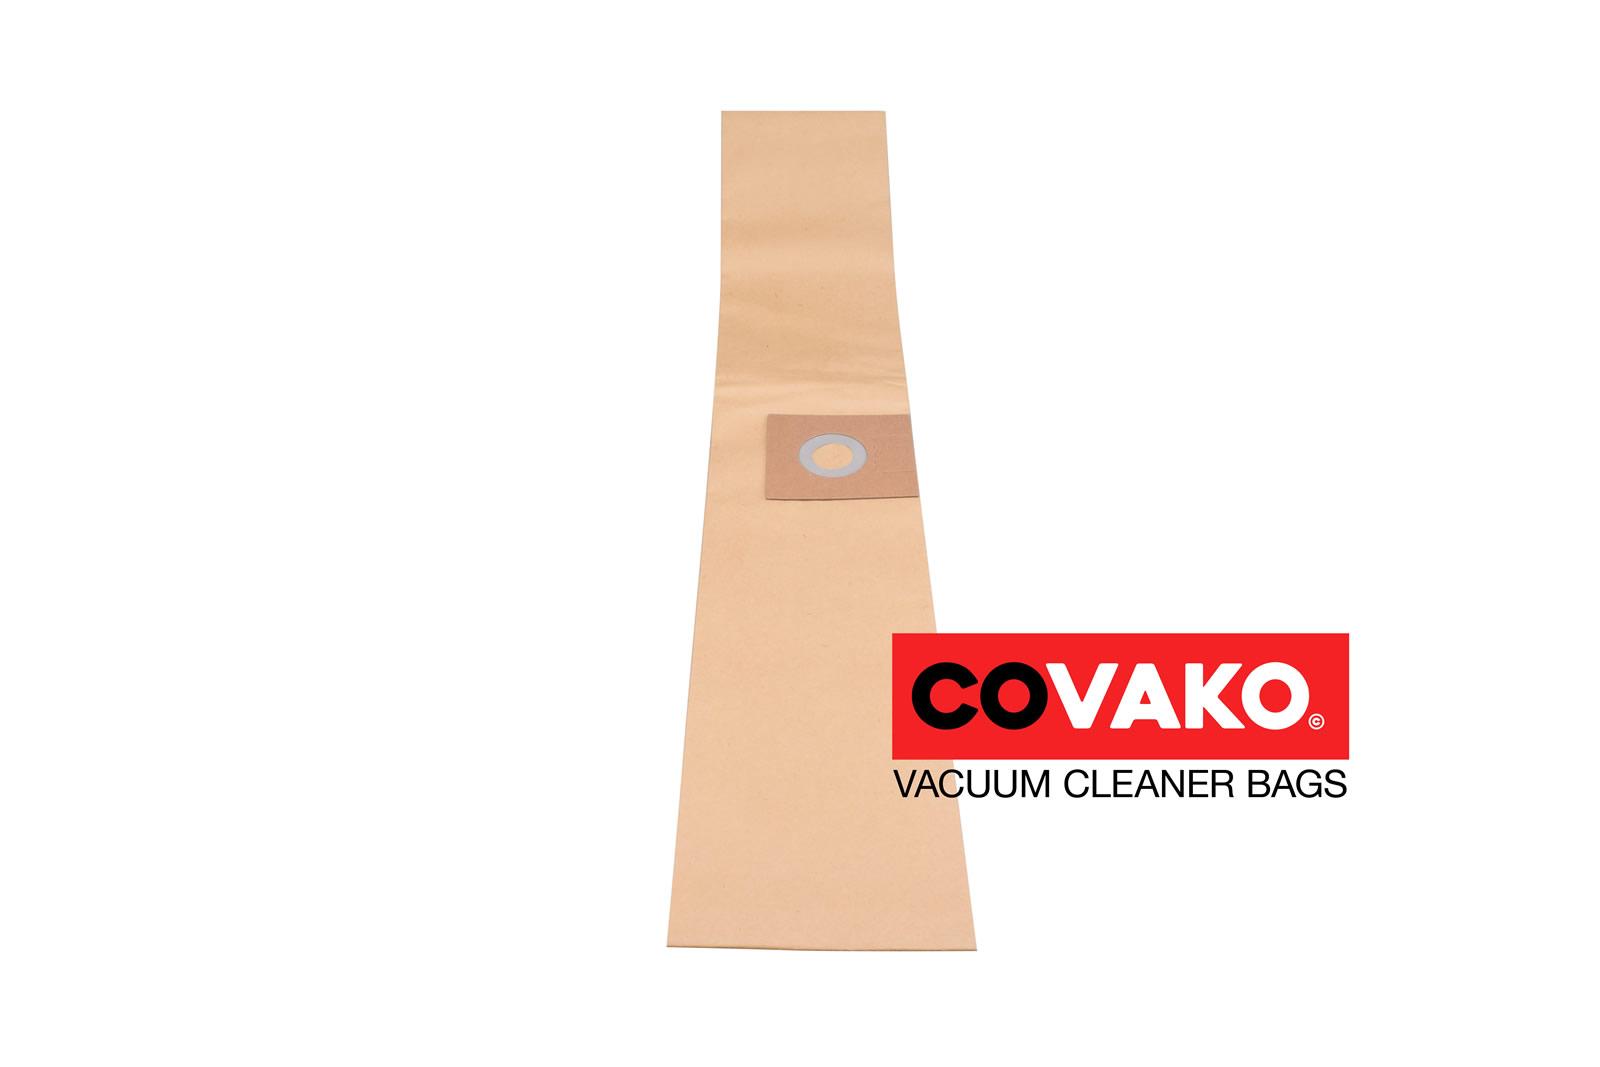 I-vac Micro S / Paper - I-vac vacuum cleaner bags